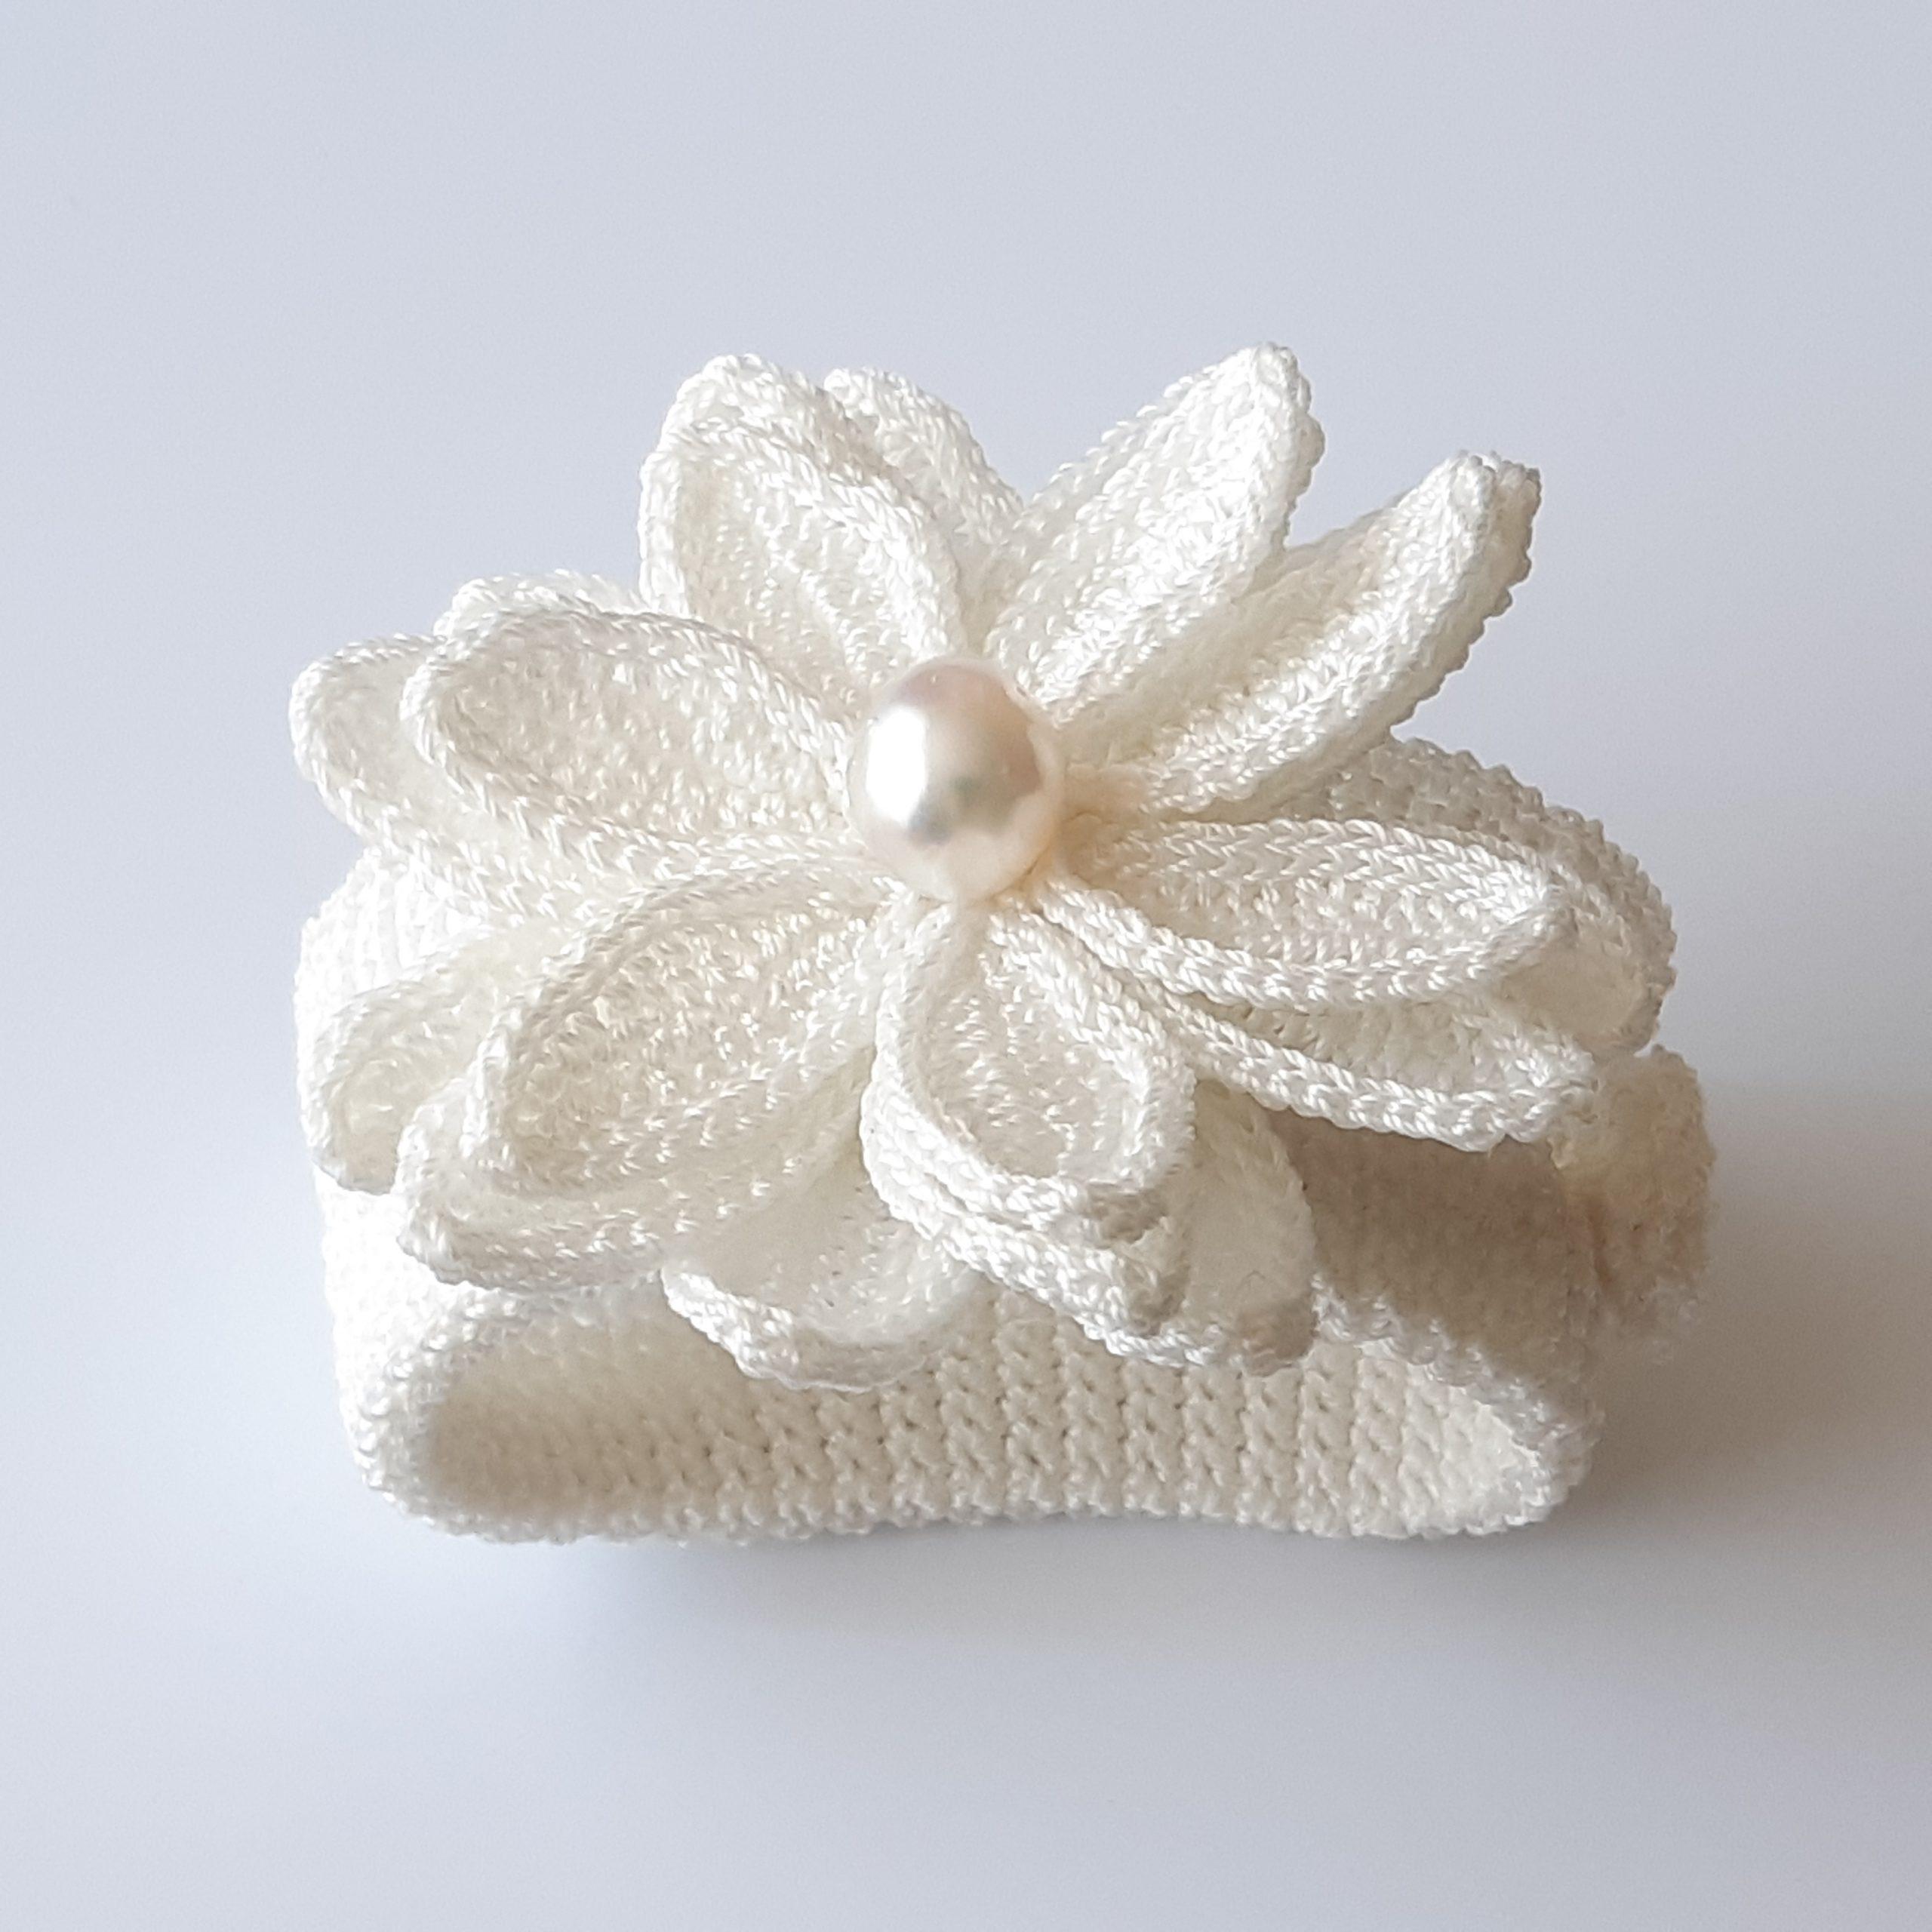 Brazalete de perla australiana y crochet